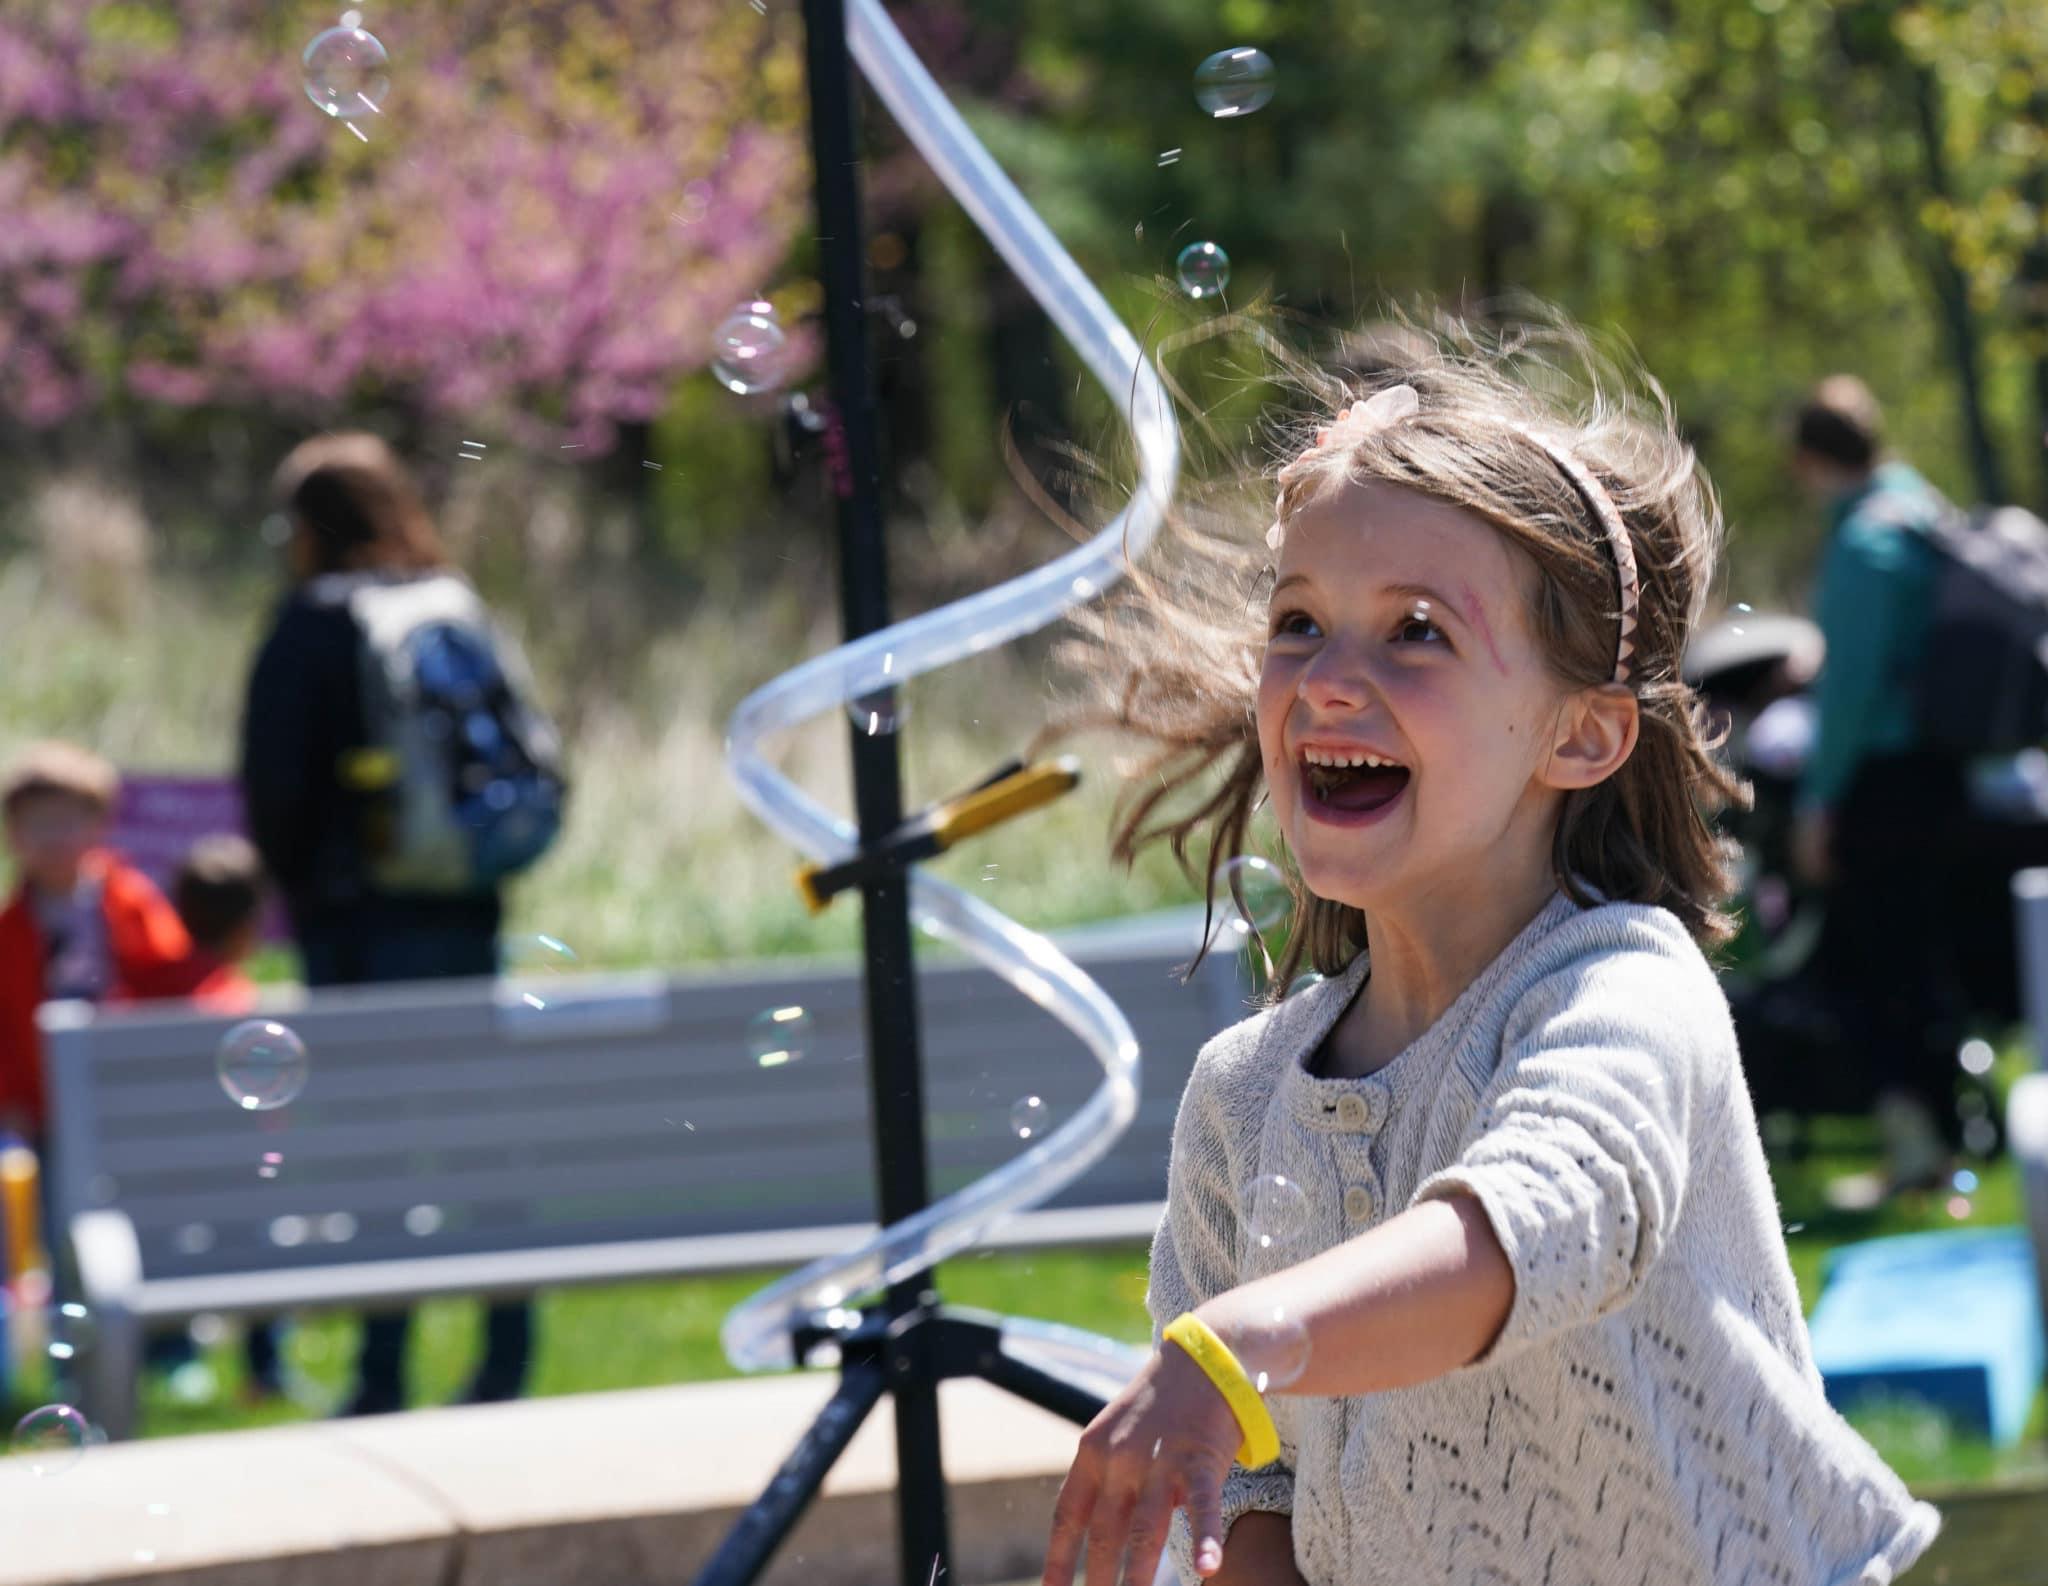 A young girl running through bubbles